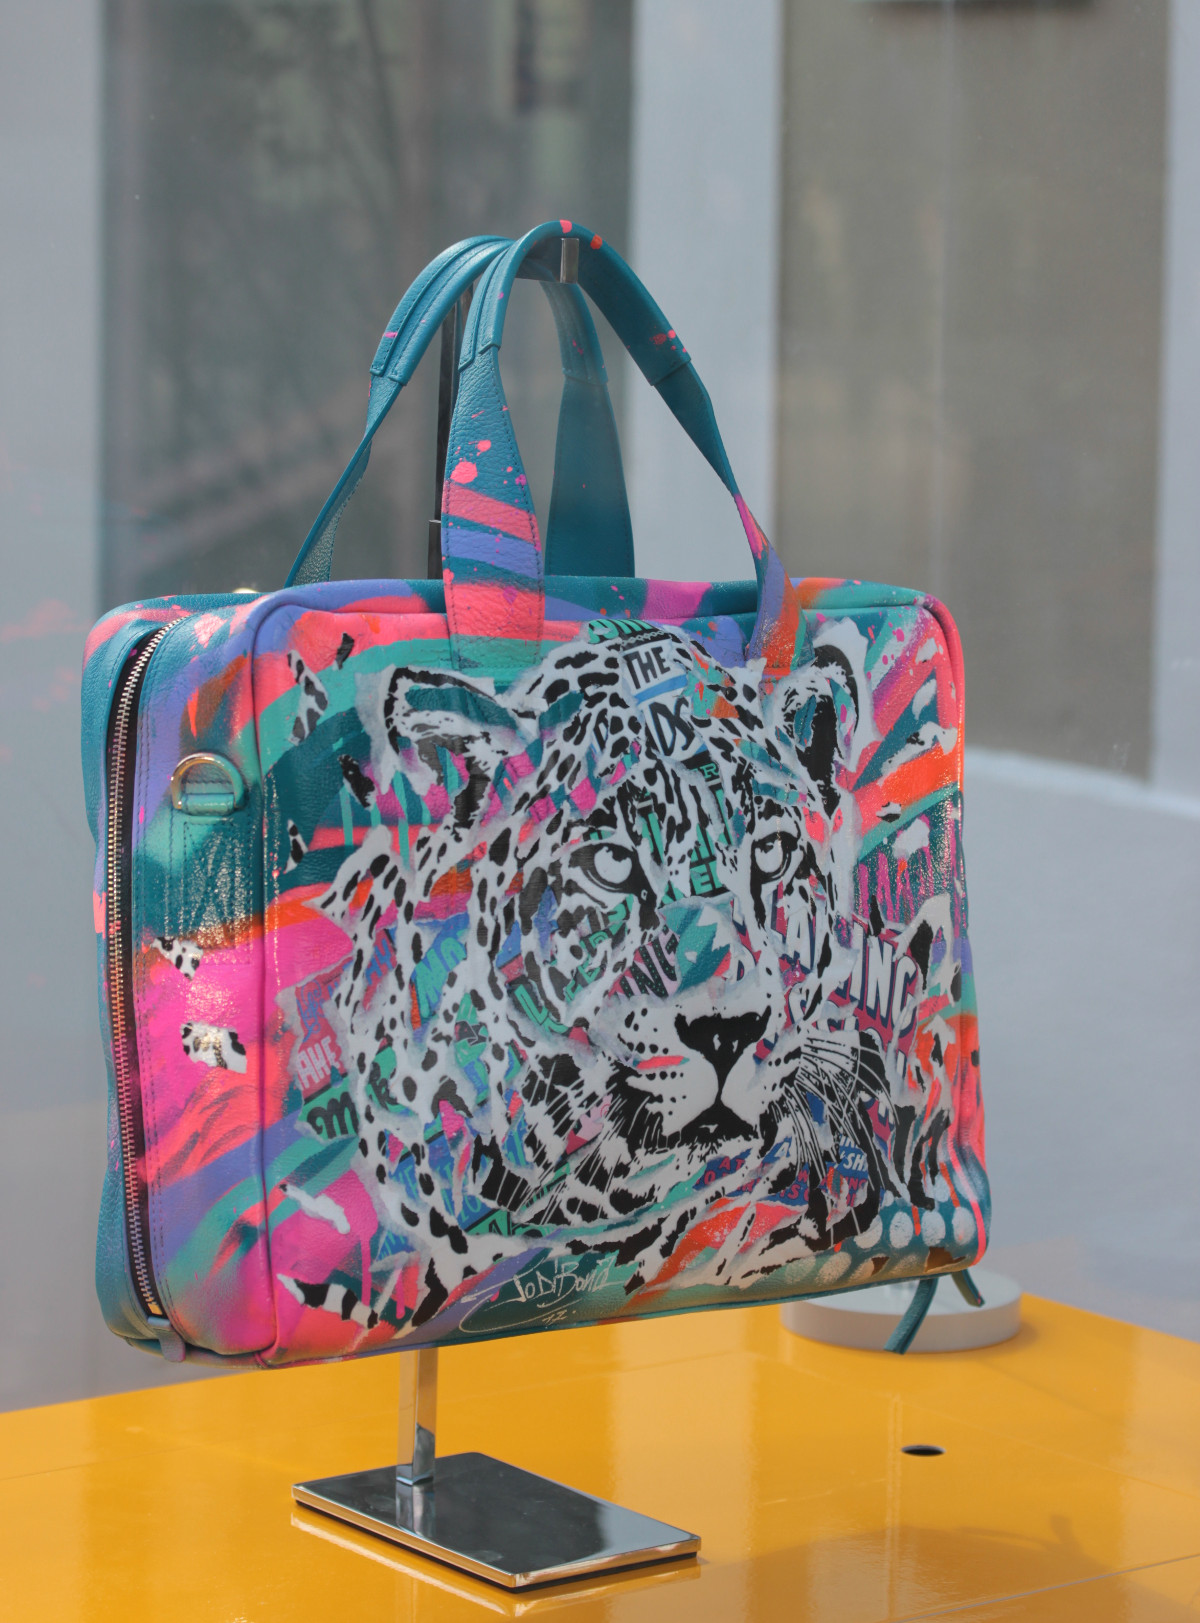 La_Vallee_Village-FashionmeetsArt-Outlet-StreetArt_event-Paul_Smith-Jo_Di_Bona-Sac-Customisation